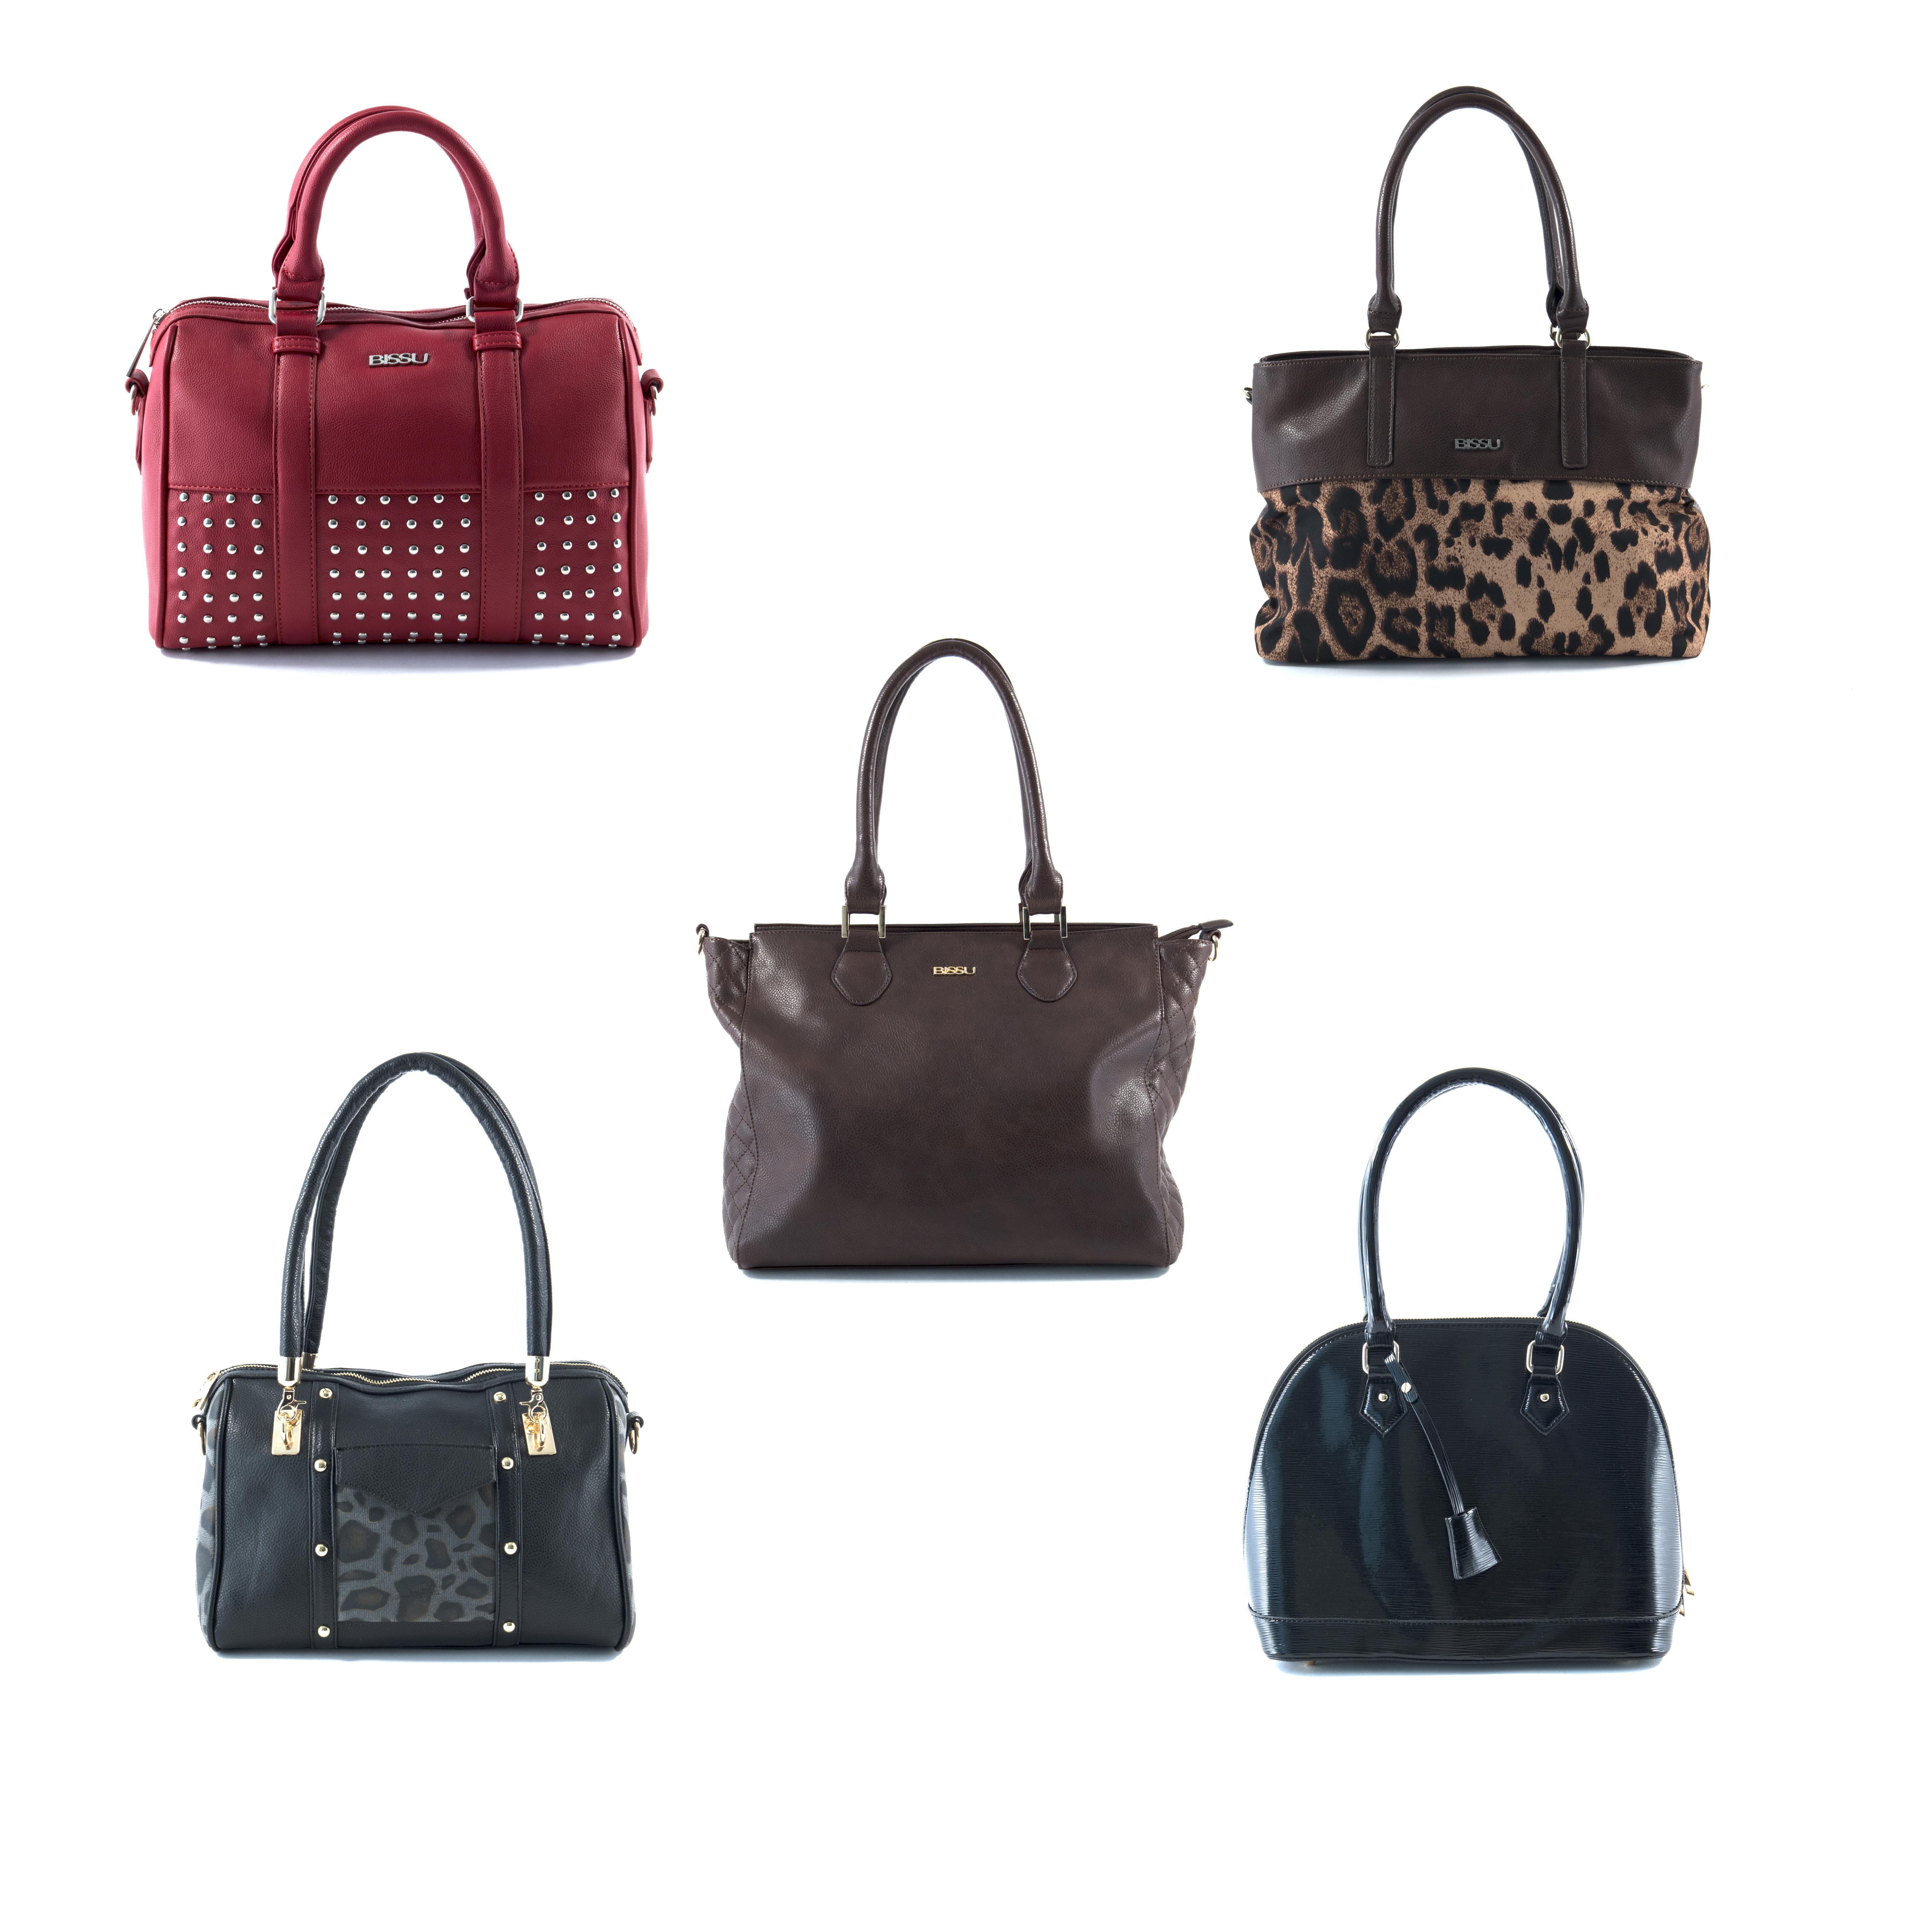 CreceCrece Crece…Bcn Bags Bissú Fashion Y Place ulFKT1Jc3